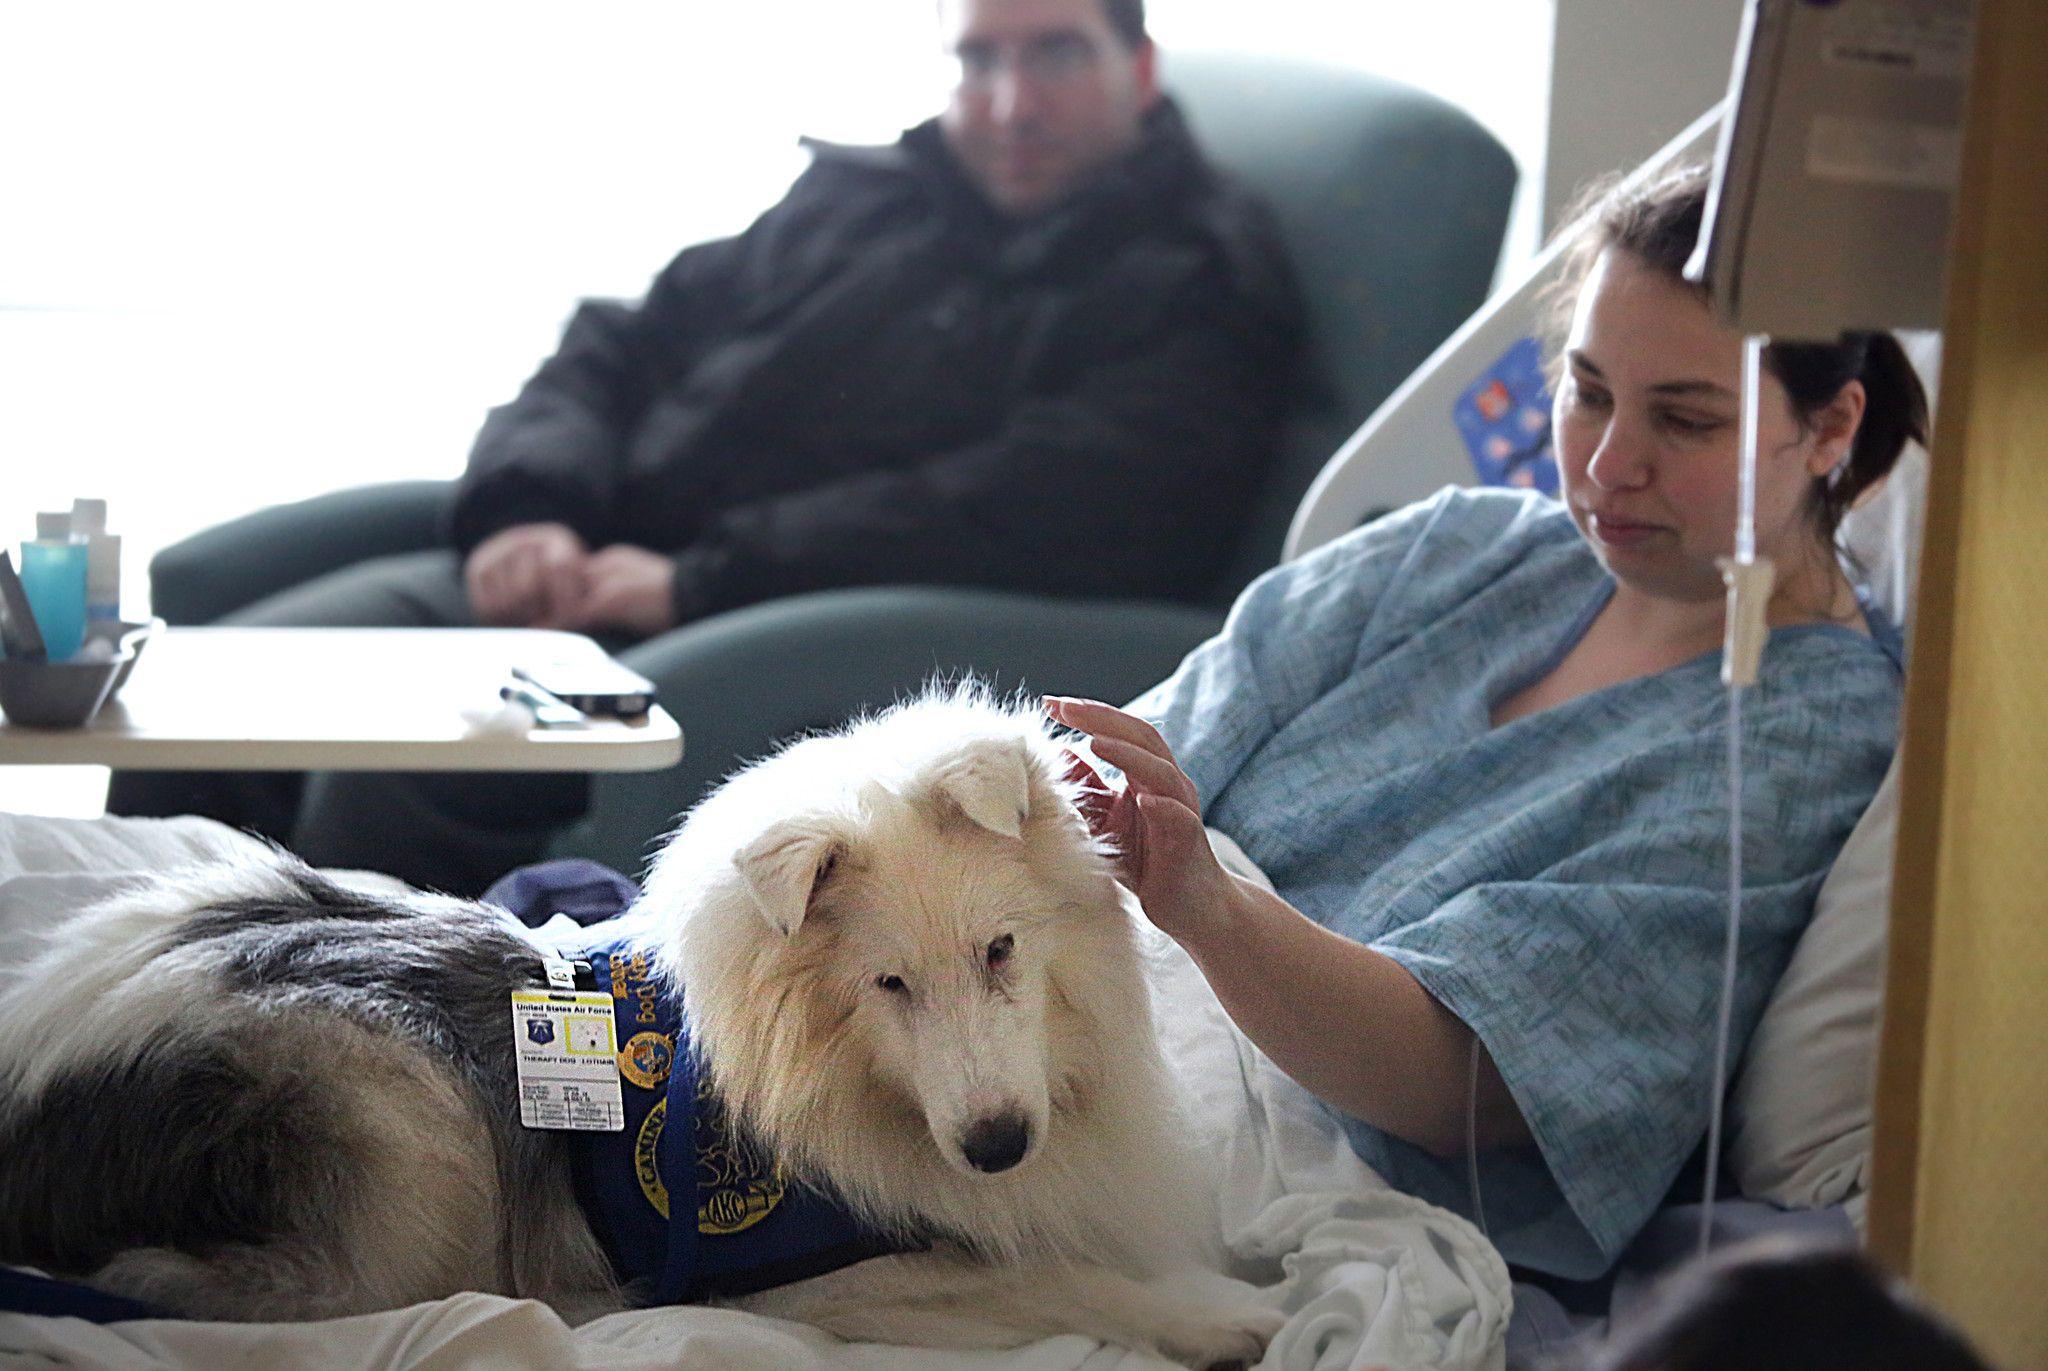 16+ Martin downs animal hospital images